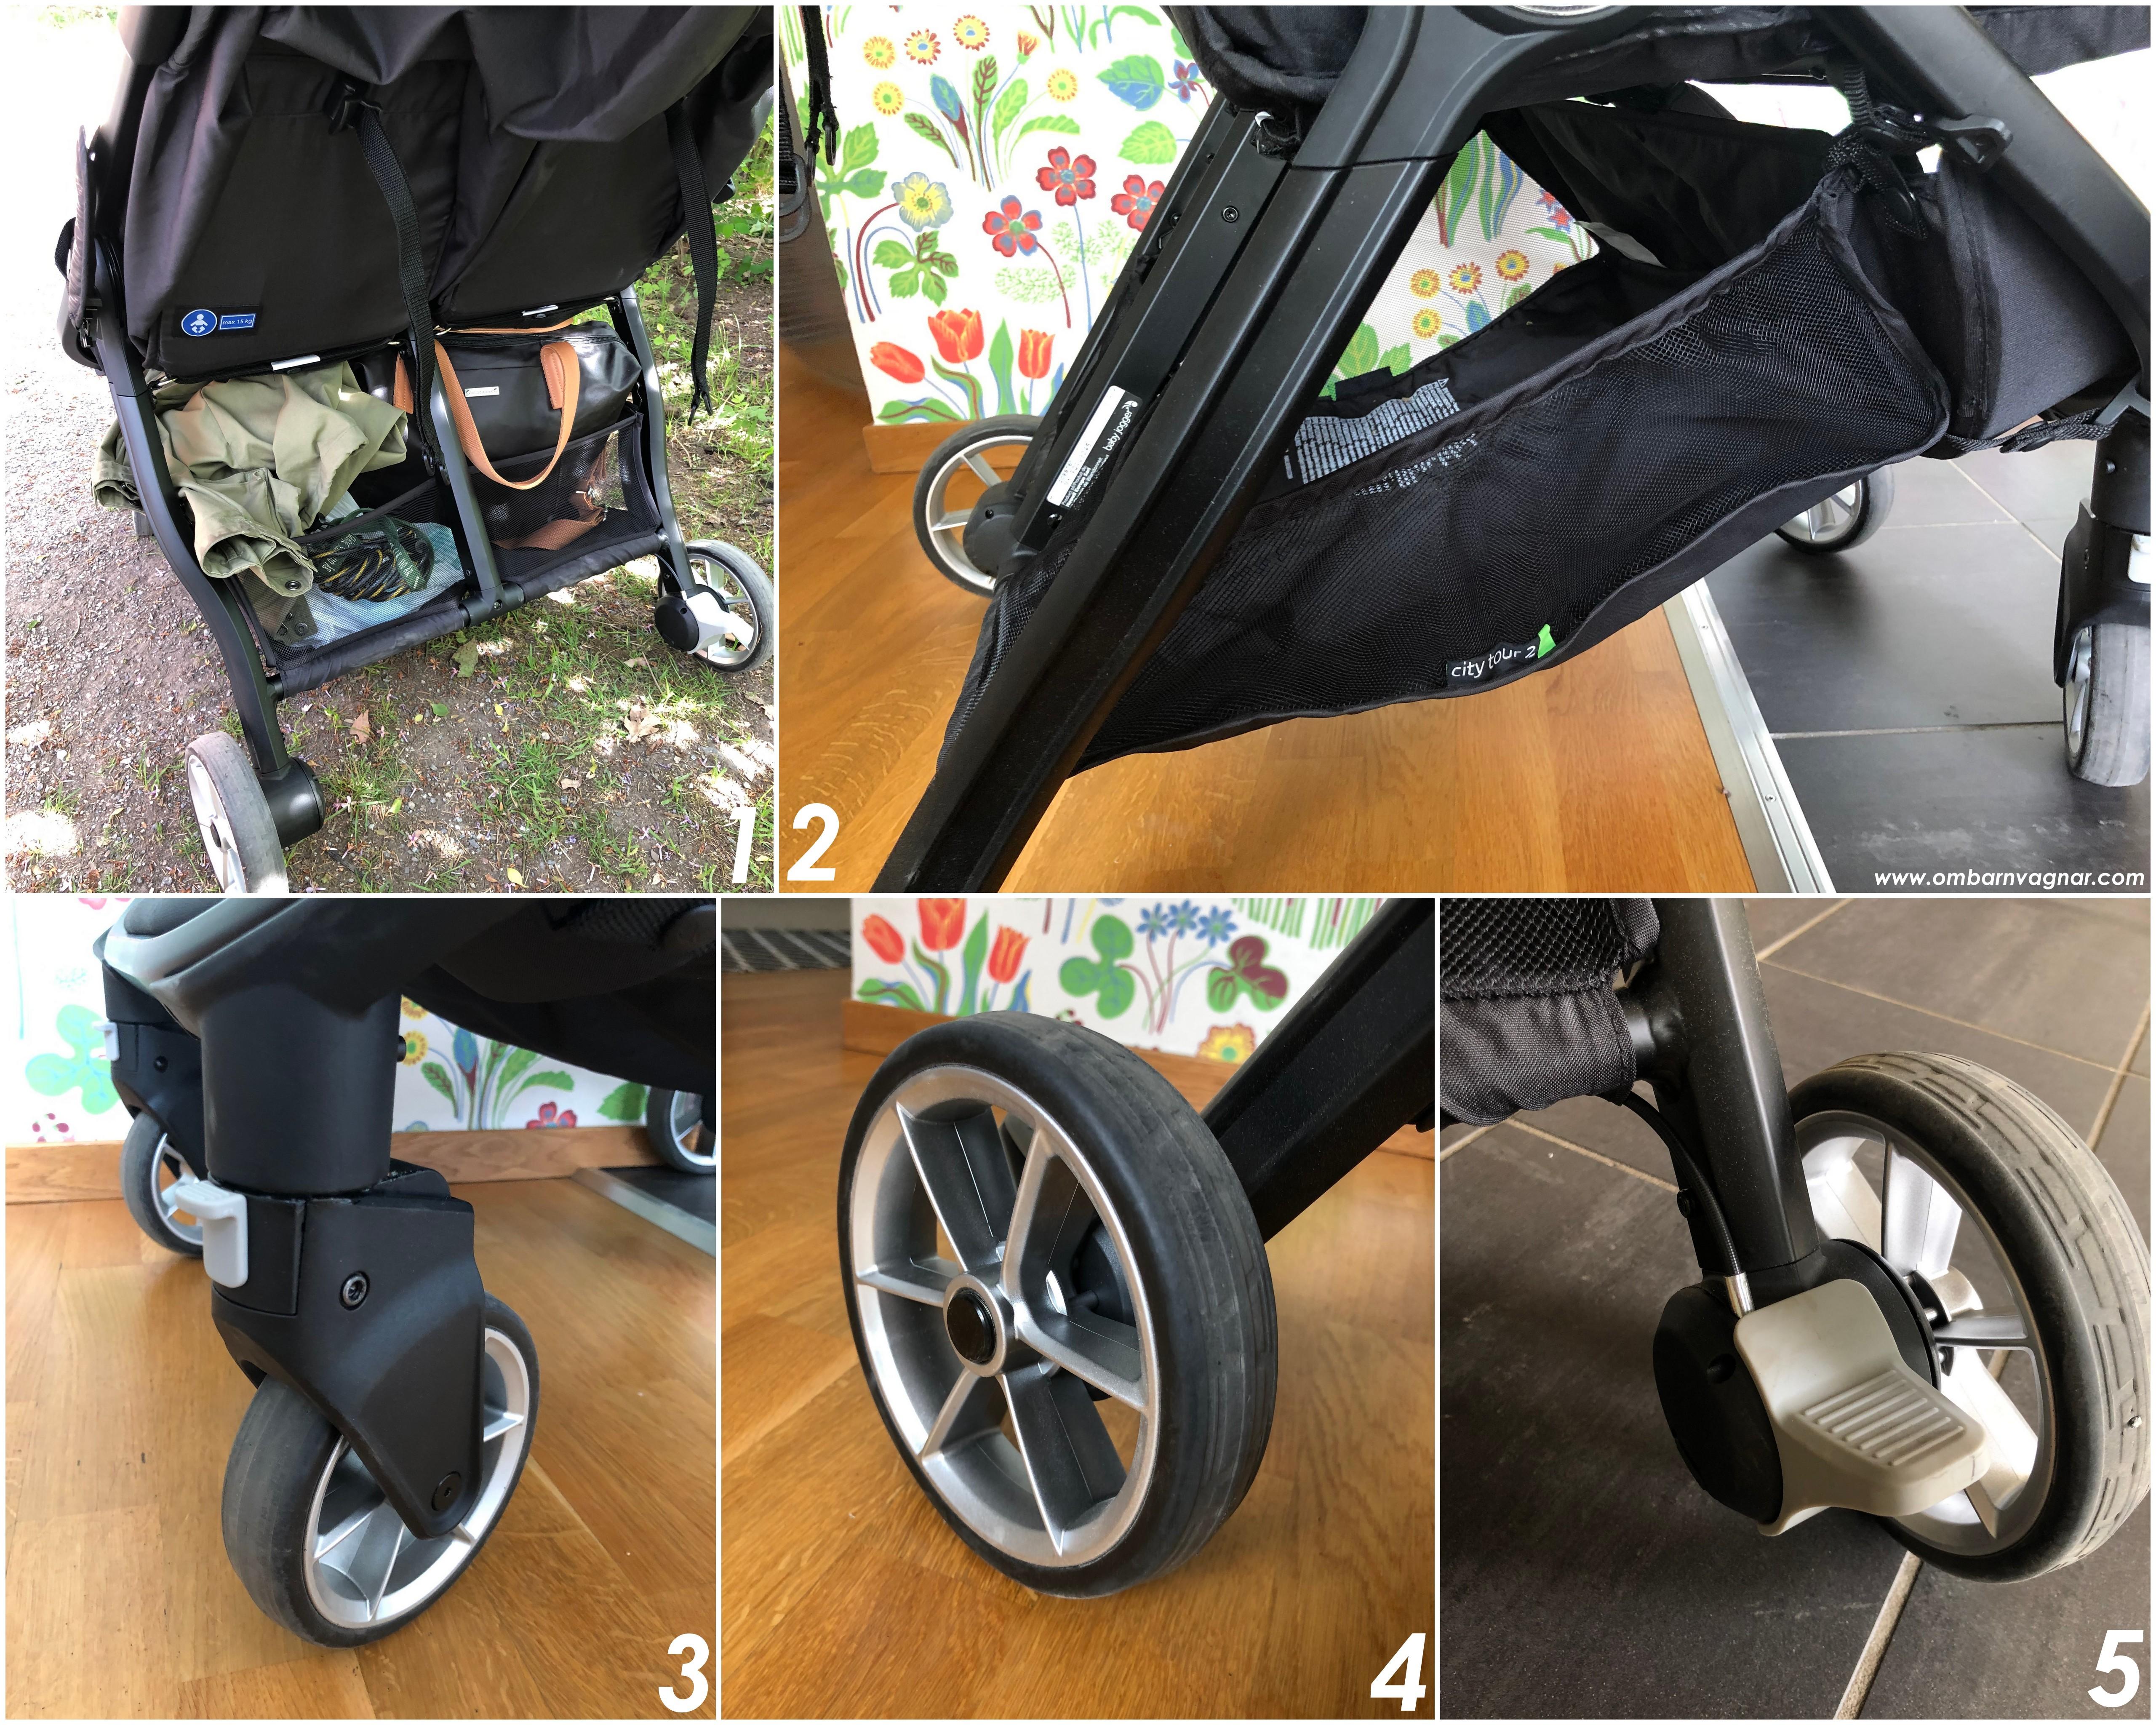 Baby Jogger City Tour 2 Double har rymlig varukorg och låsbara hjul